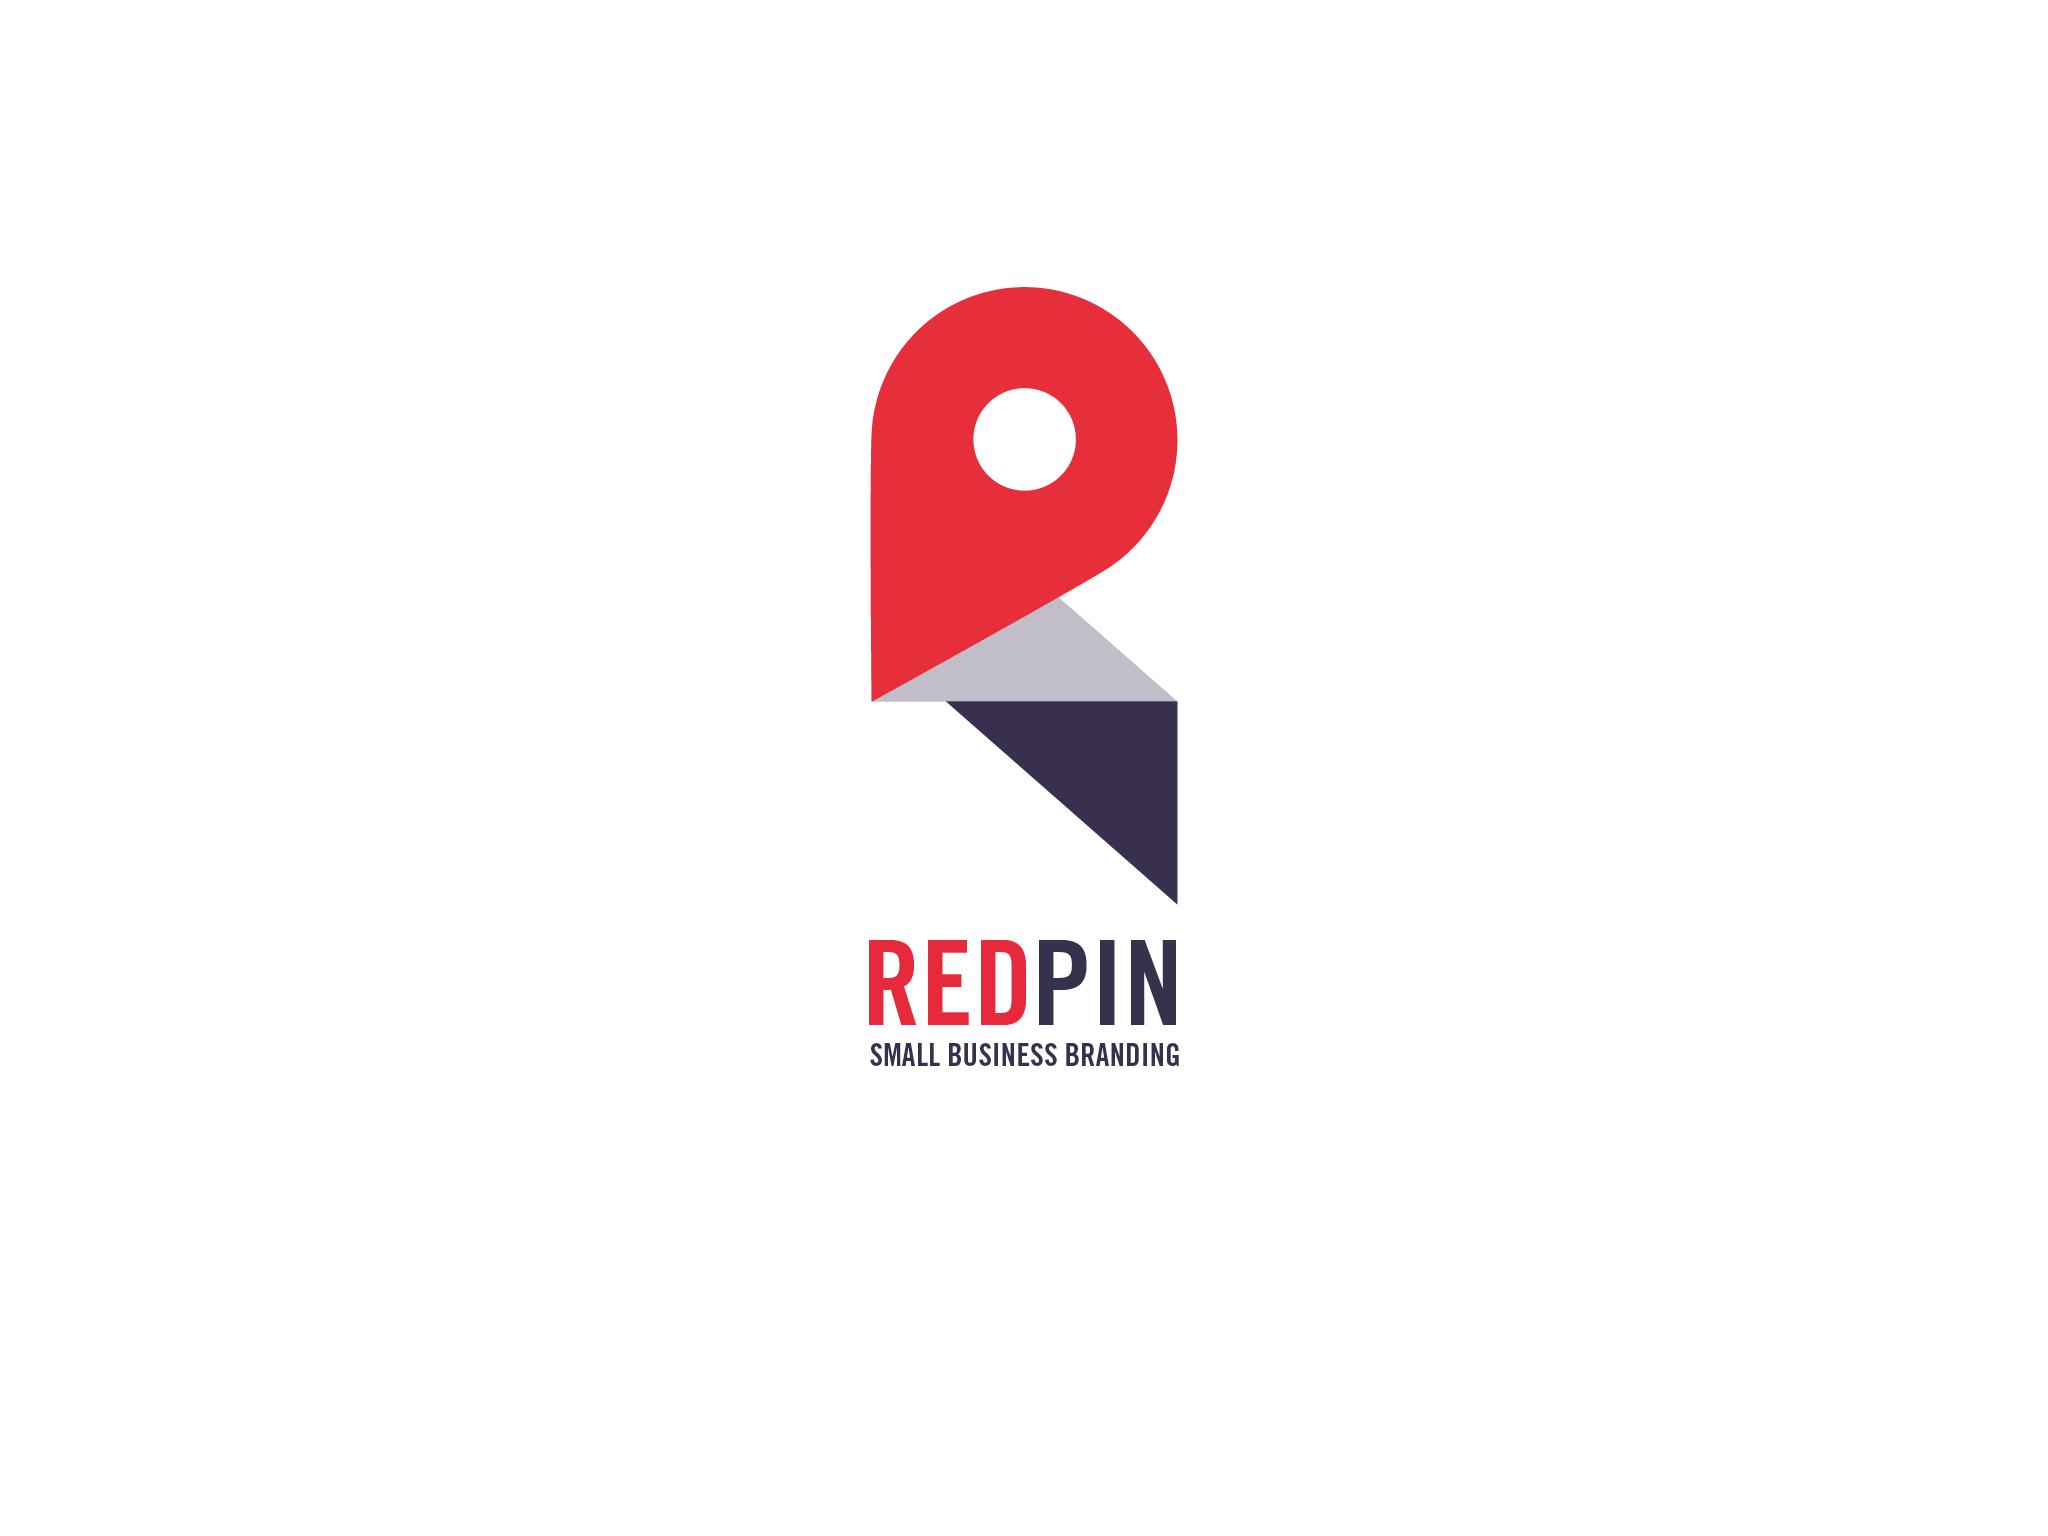 redpin.jpg